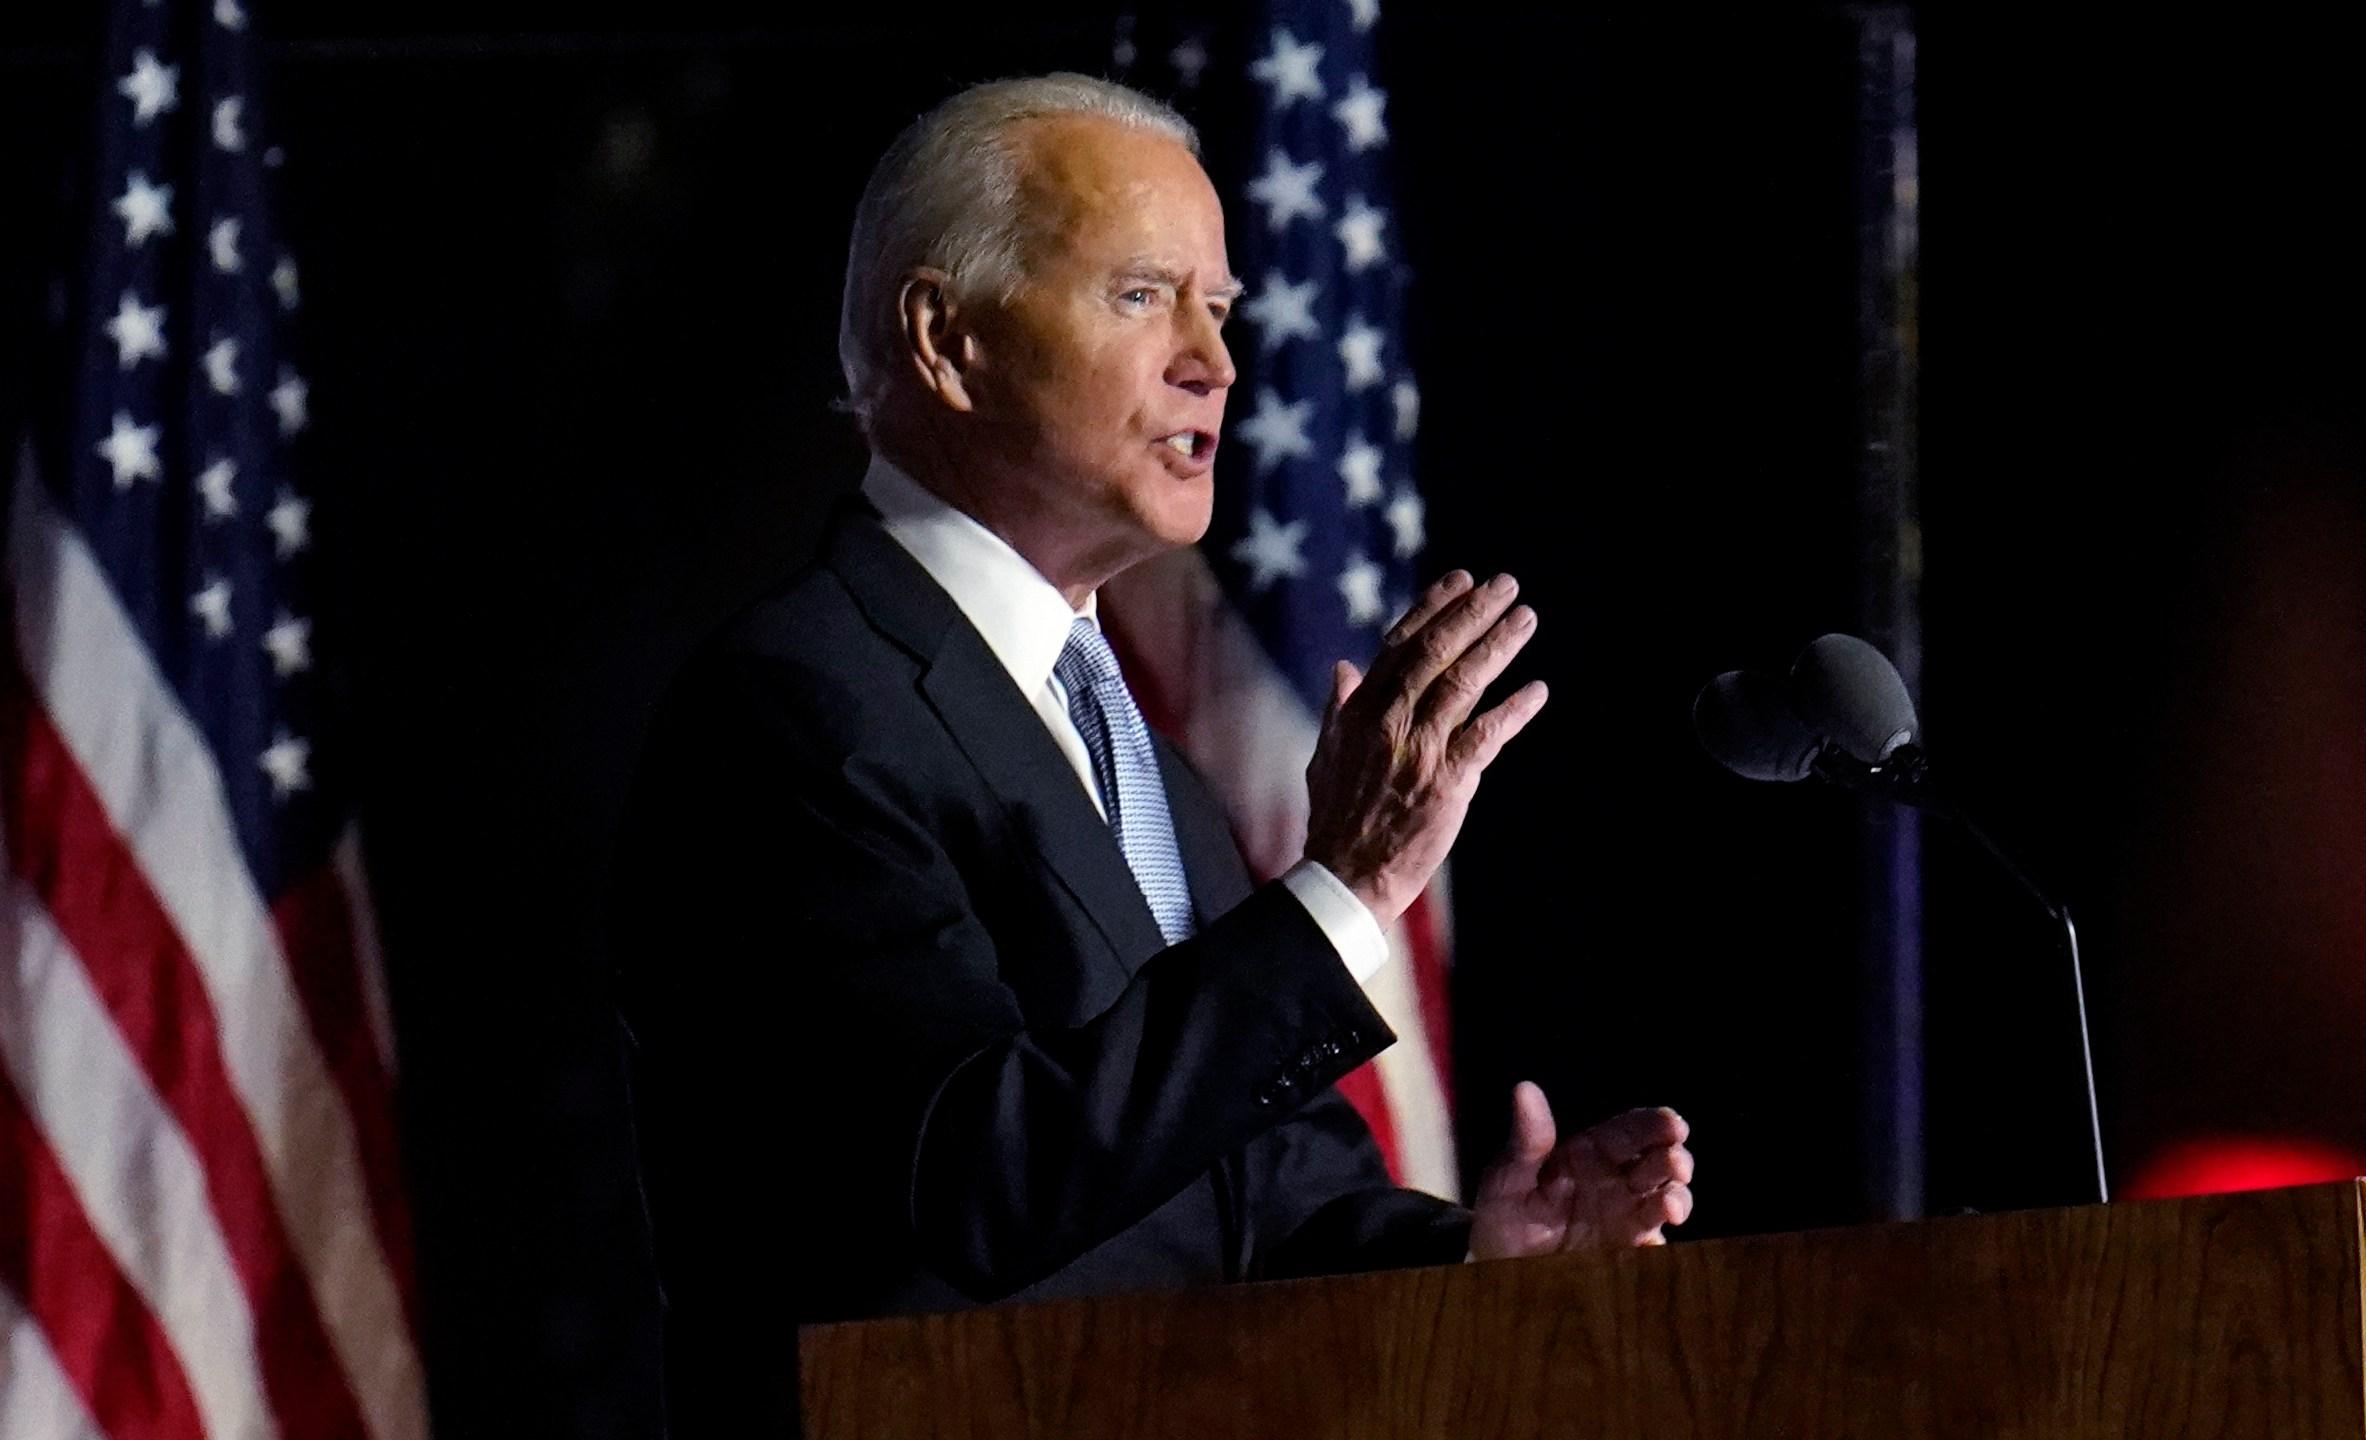 President-elect Joe Biden speaks in Wilmington, Del., Saturday, Nov. 7, 2020. (Paul Sancya/AP Photo)